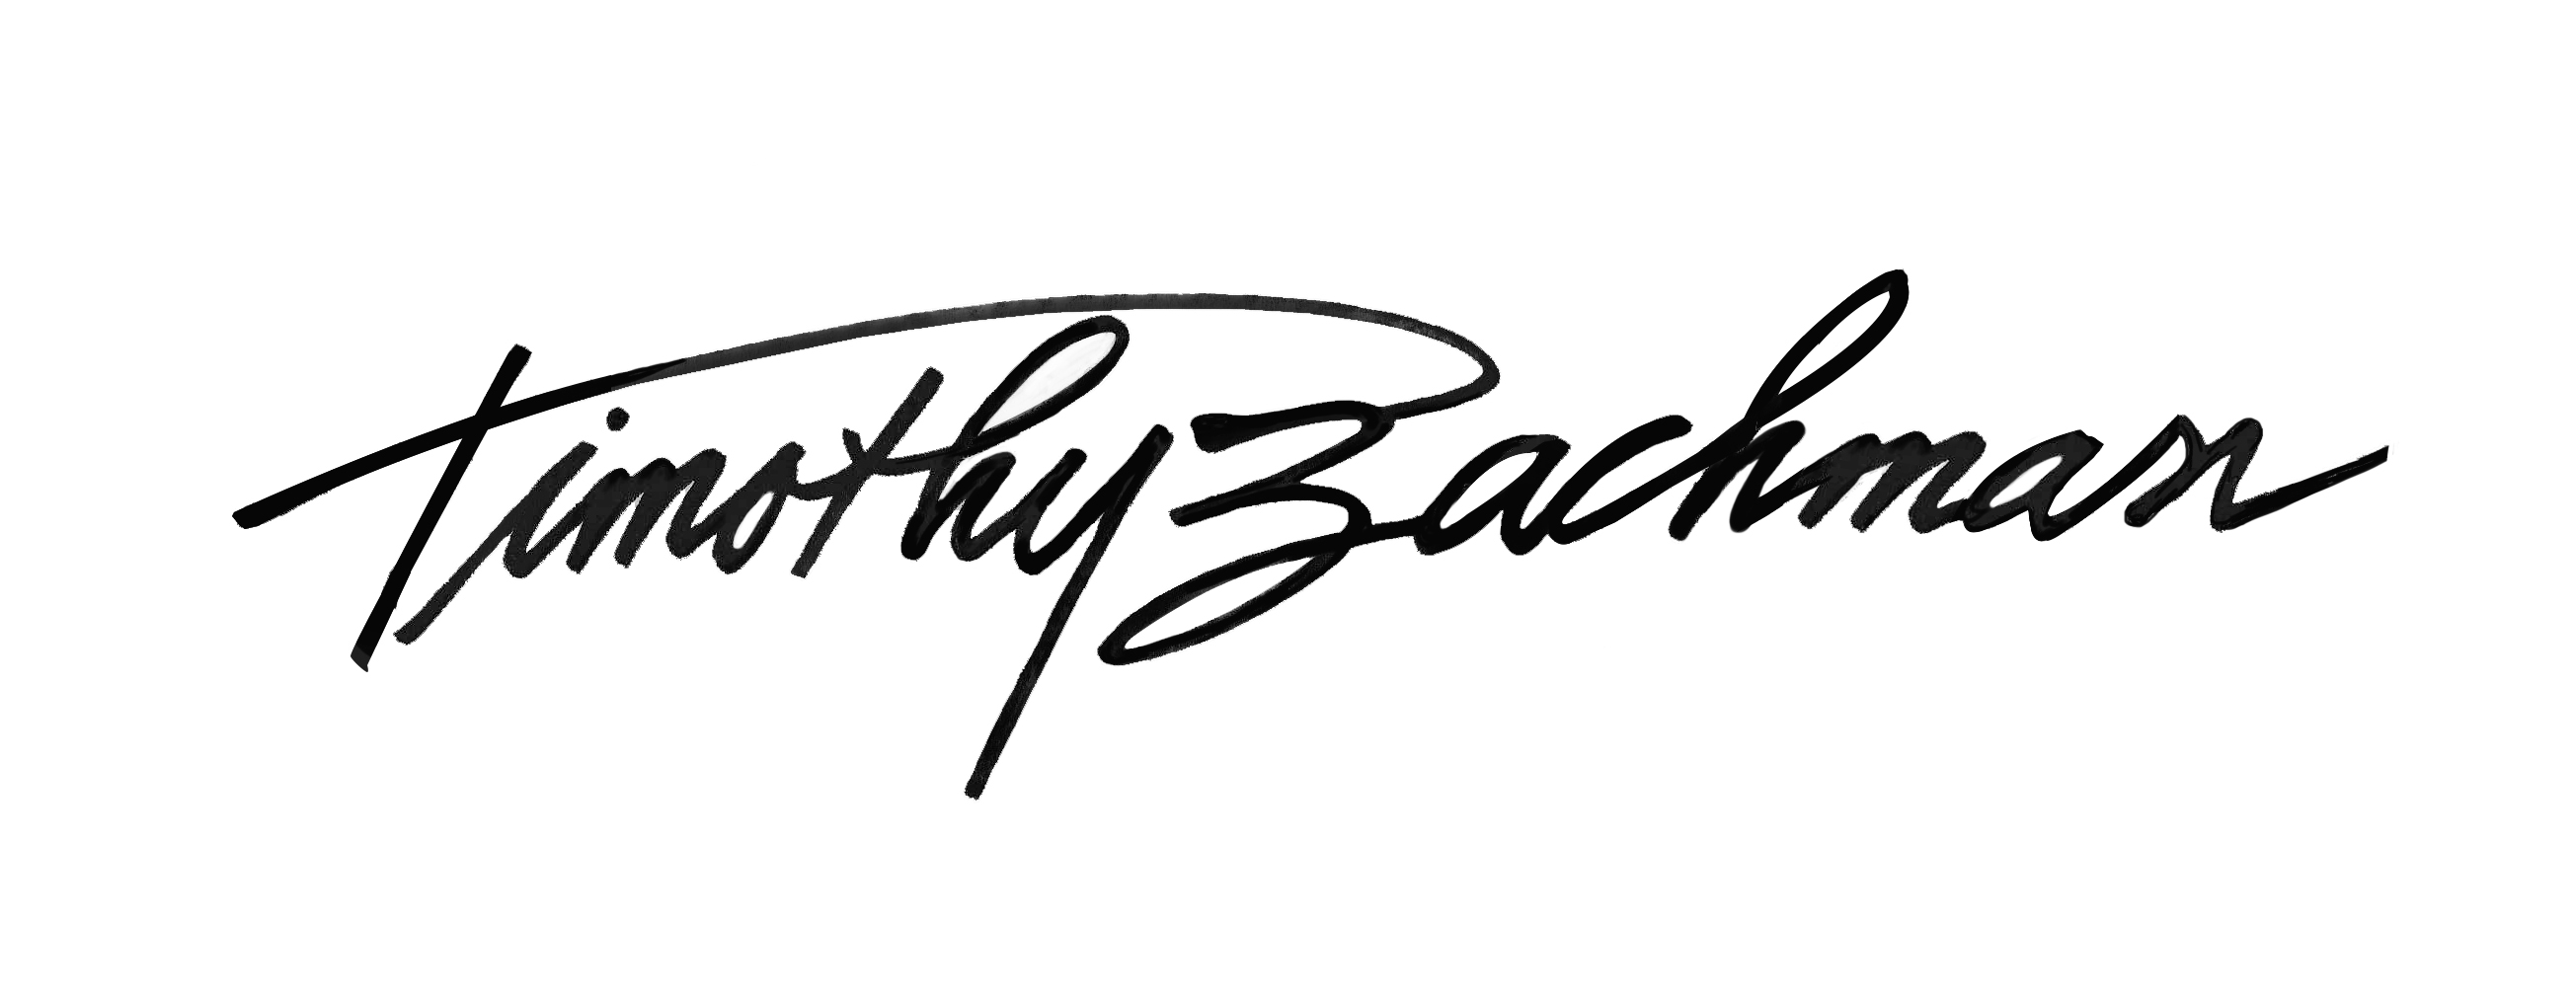 Timothy Bachman Signature